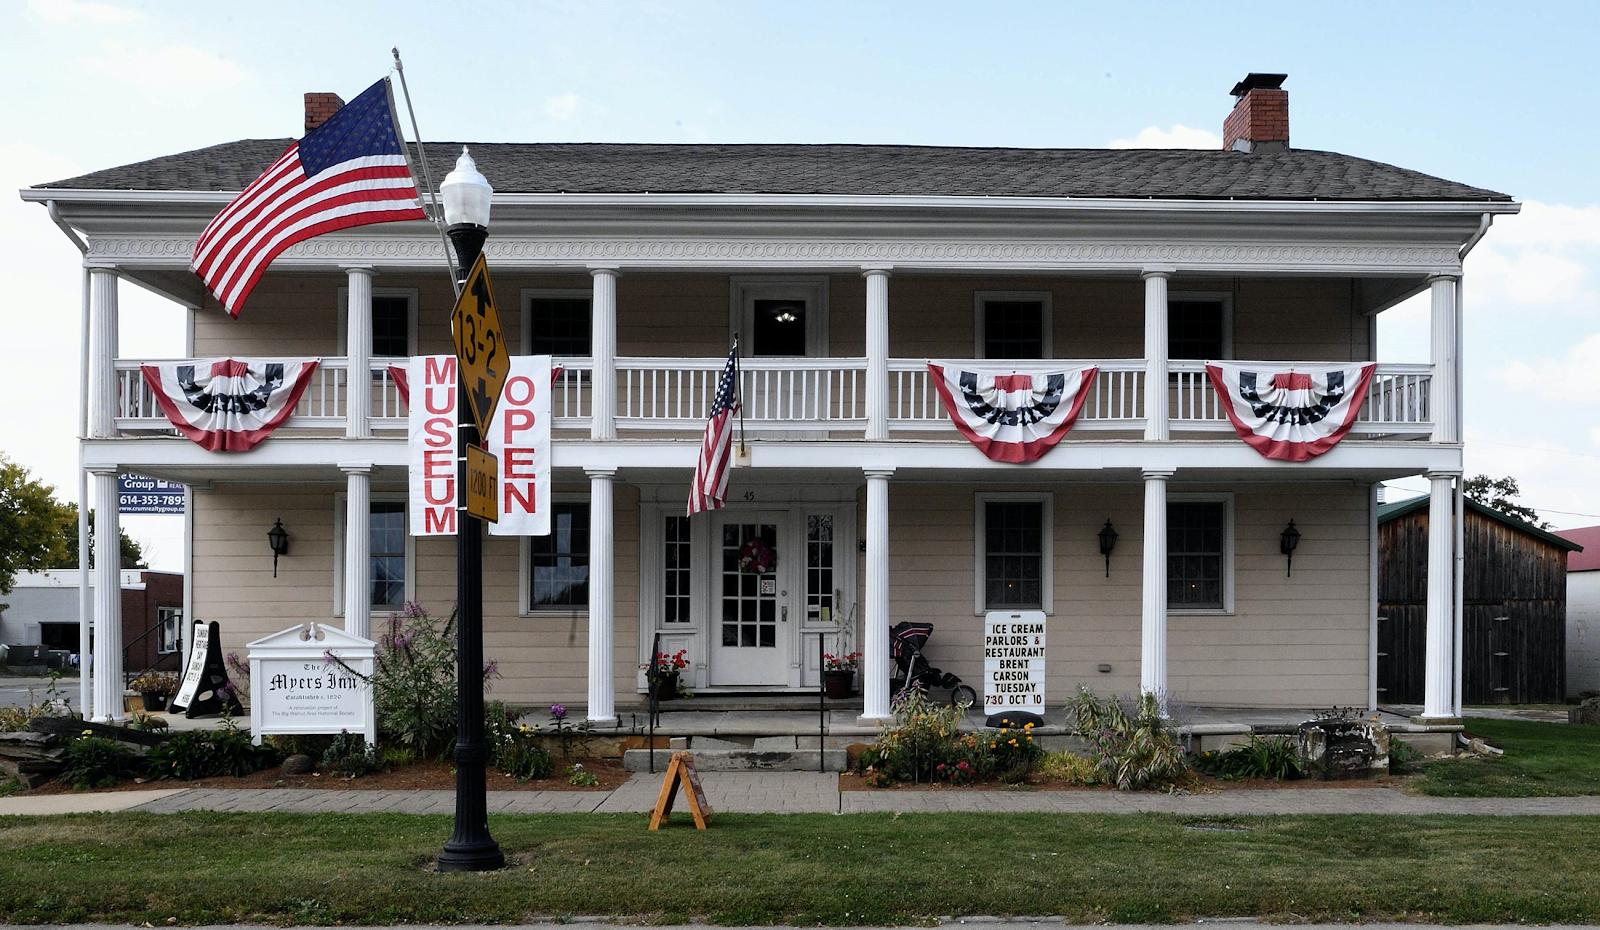 outside of the Myers Inn Museum